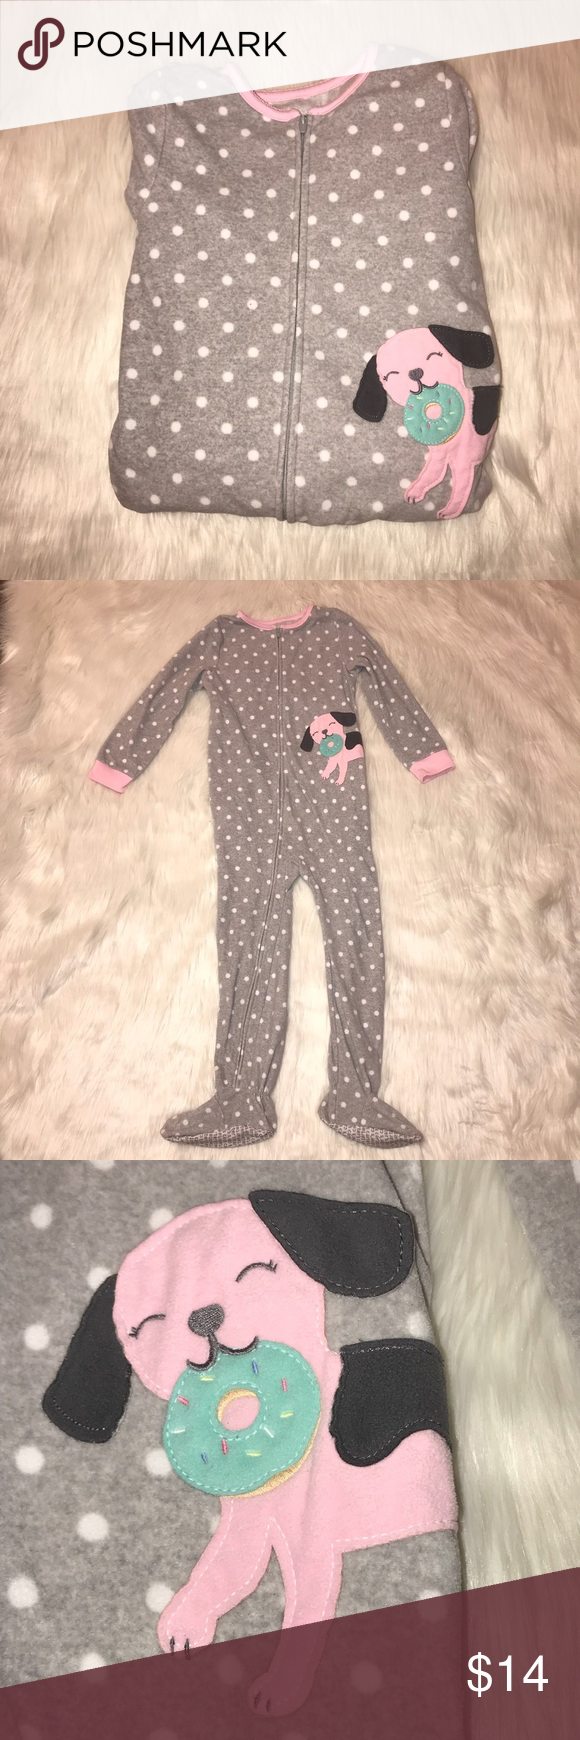 13a140050 Girls Carters Donut Dog Onesie Pajamas